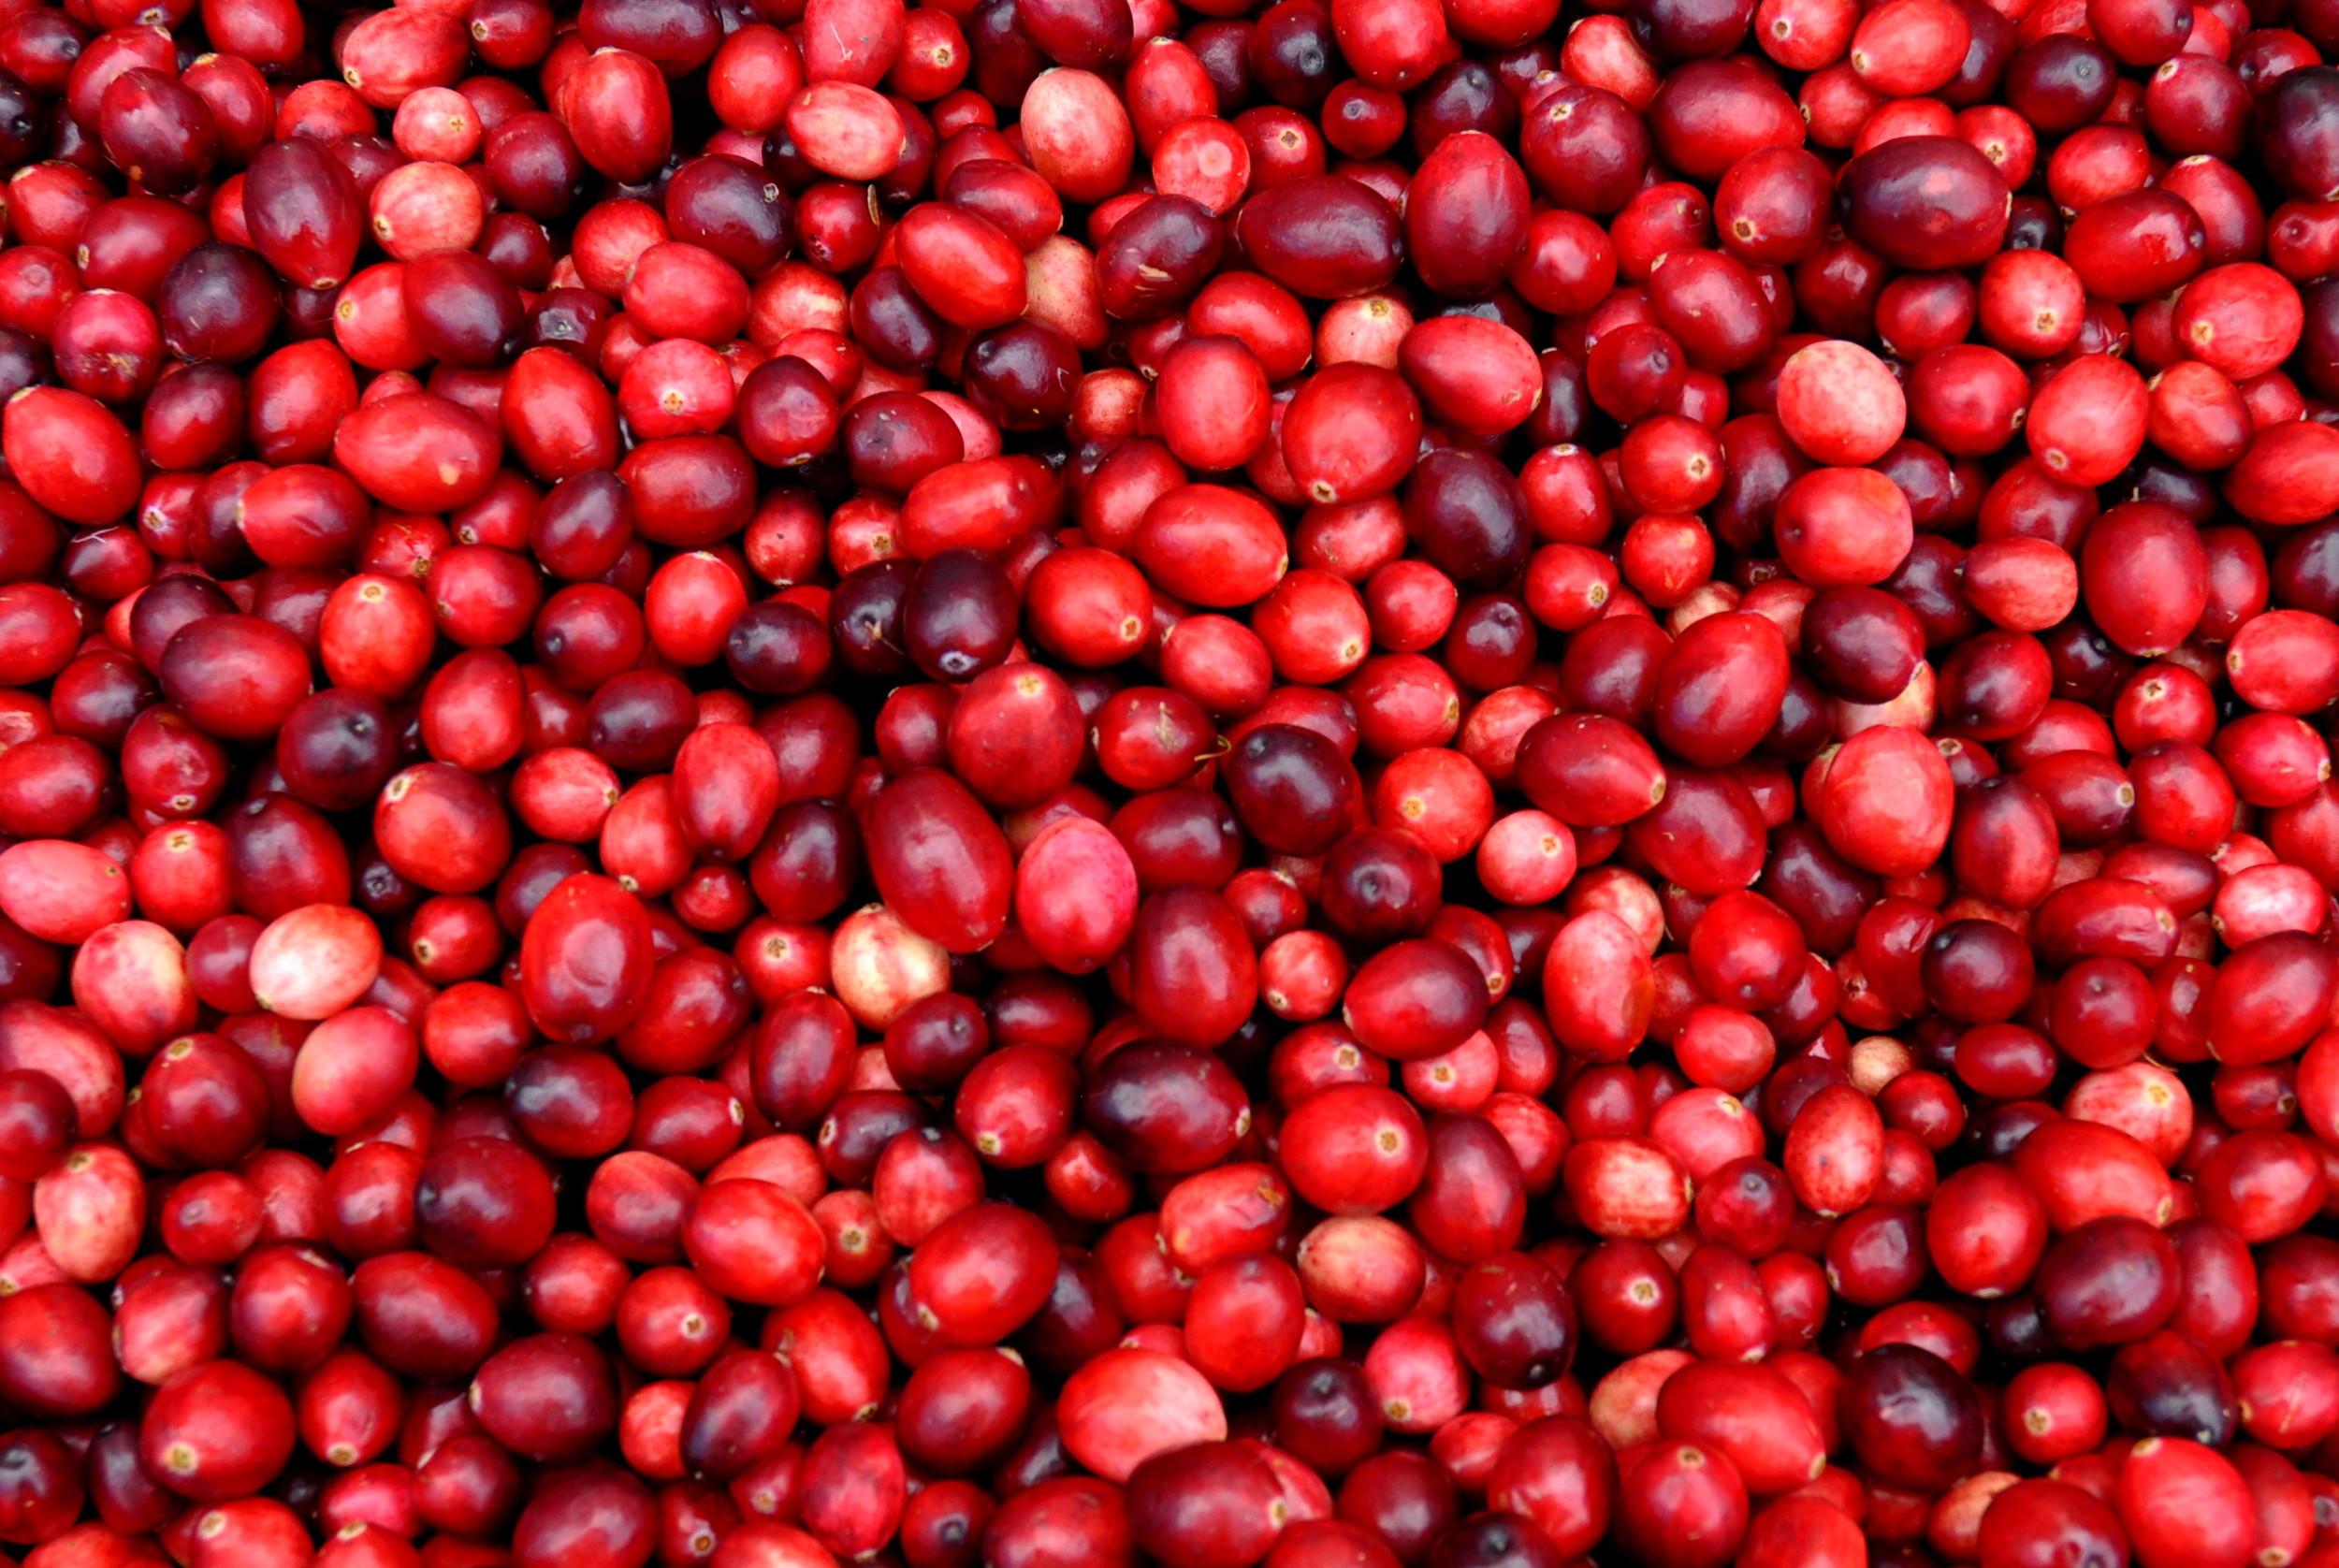 Fresh cranberries from Bloom Creek Farm at Ballard Farmers Market. Copyright 2014 by Zachary D. Lyons.